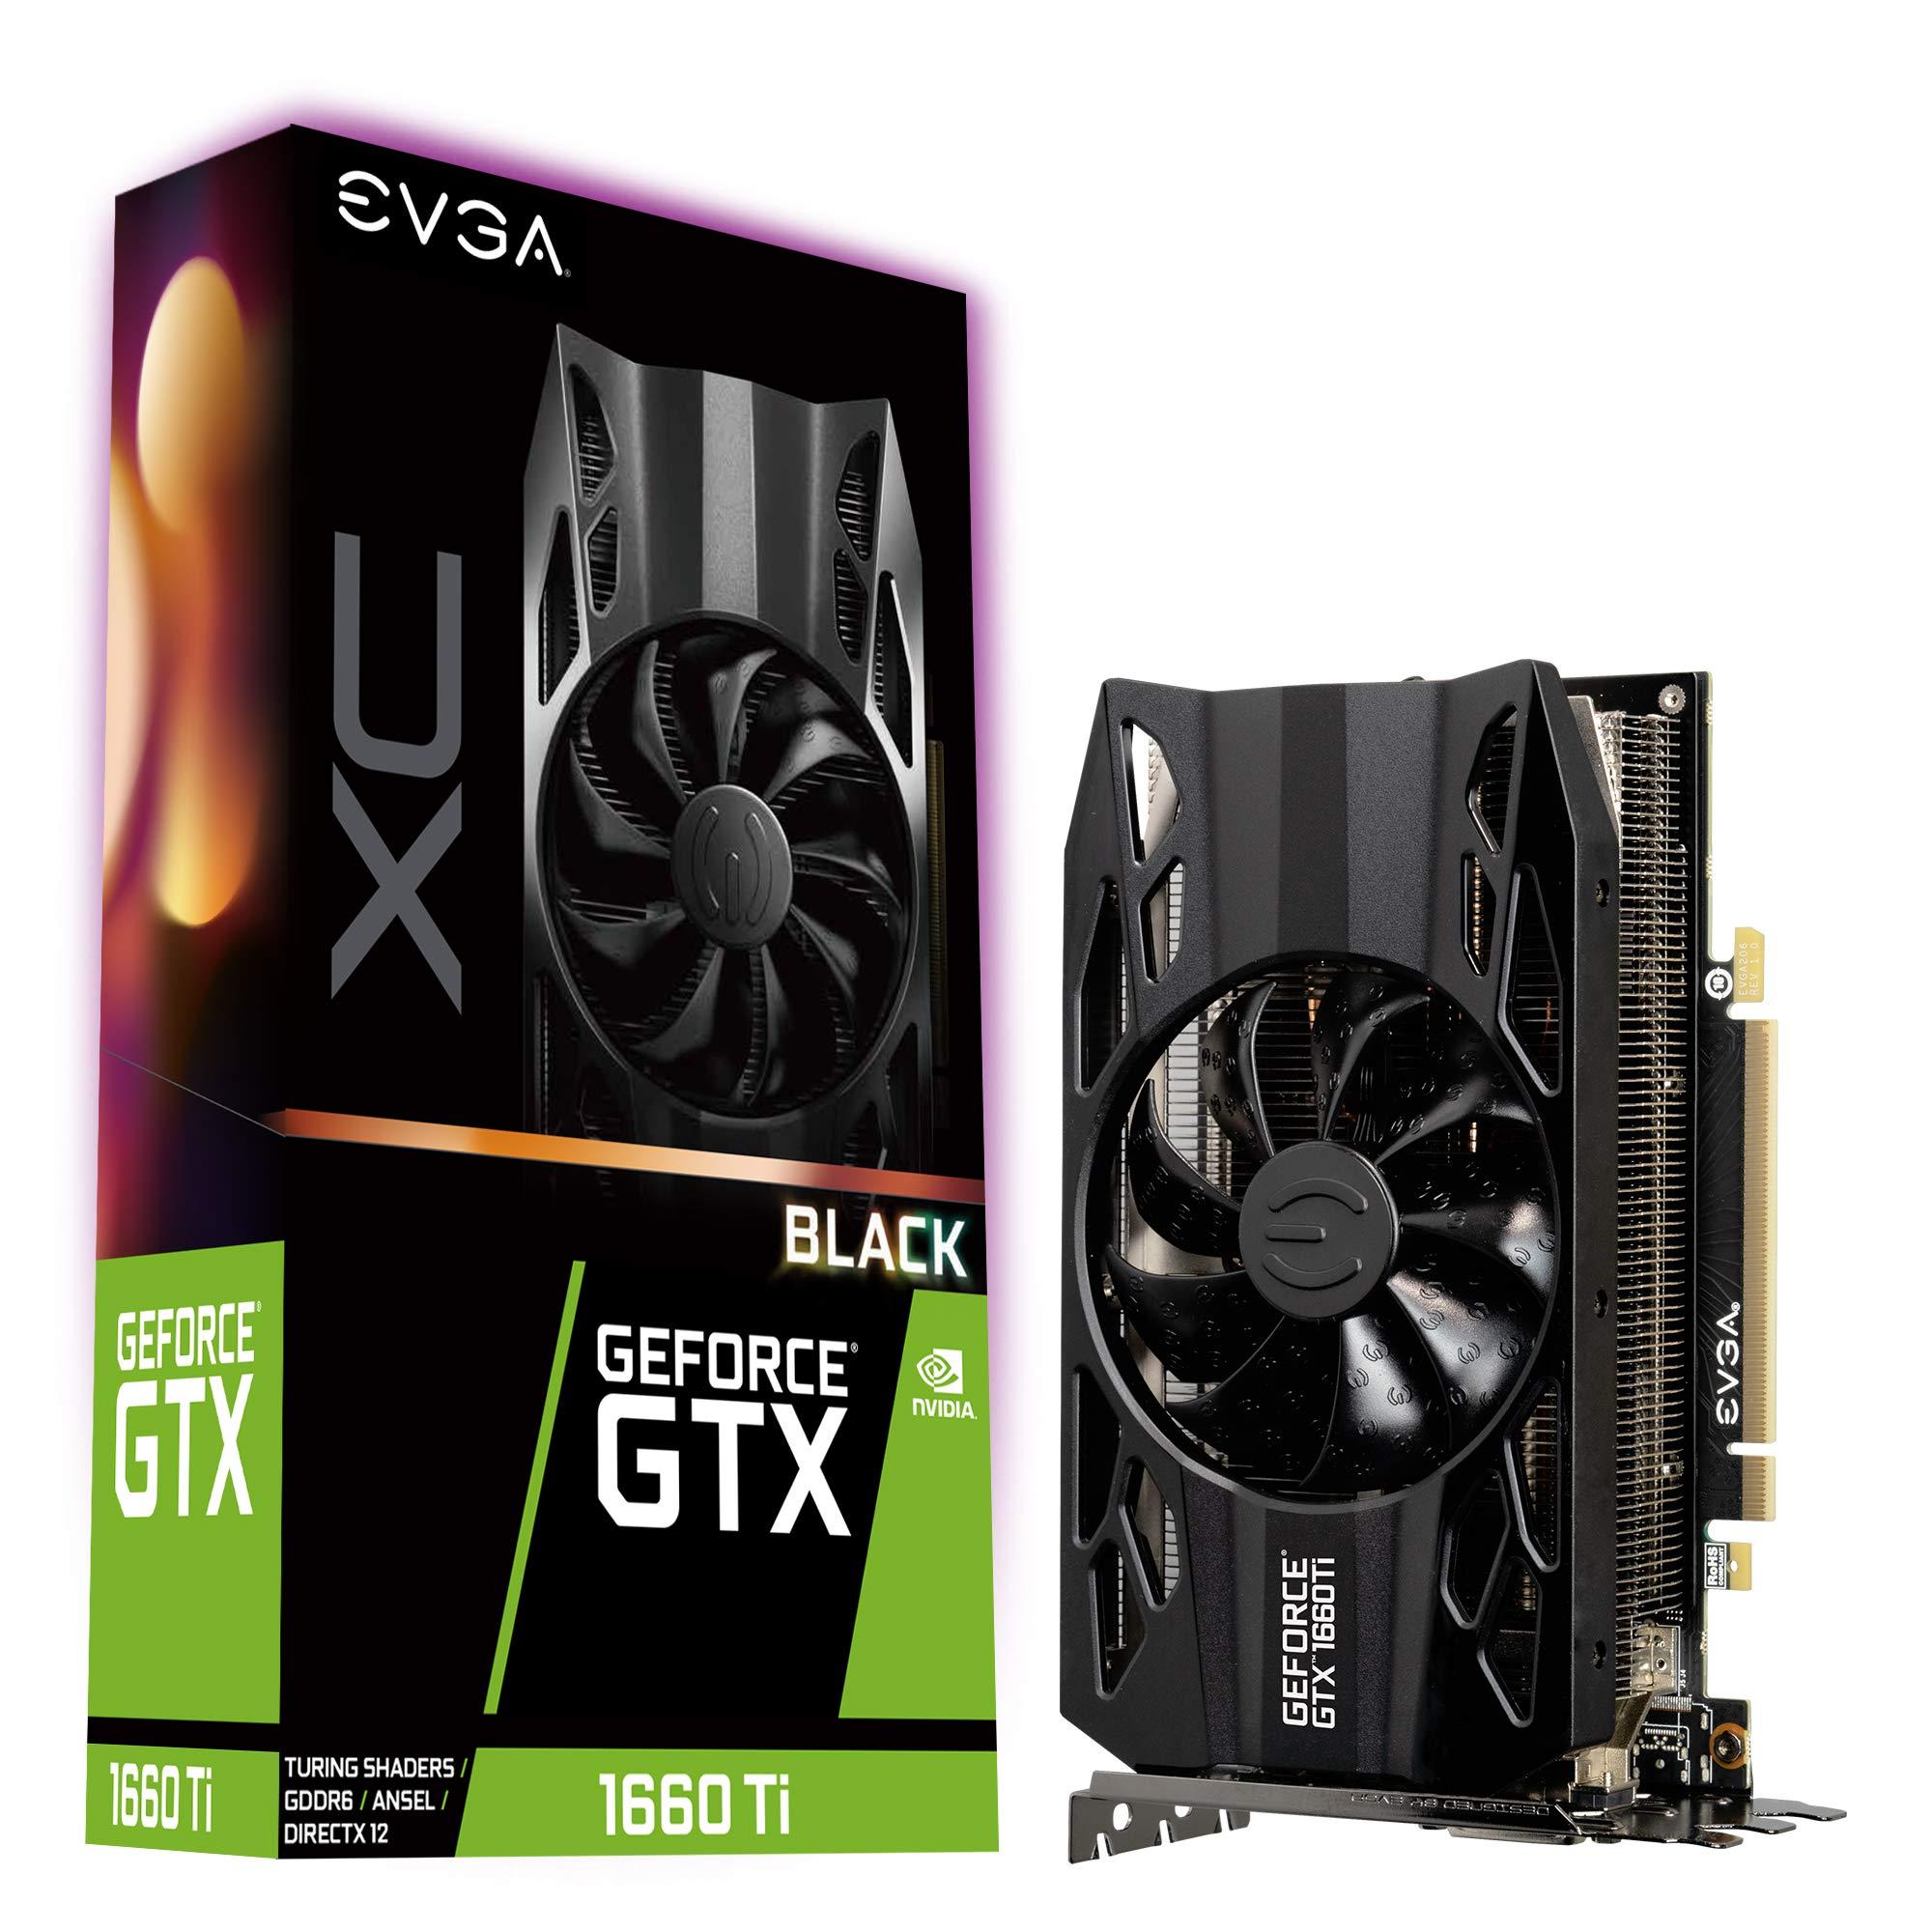 EVGA GeForce GTX 1660 Ti XC Black Gaming, 6GB GDDR6, HDB Fan Graphics Card 06G-P4-1261-KR by EVGA (Image #1)